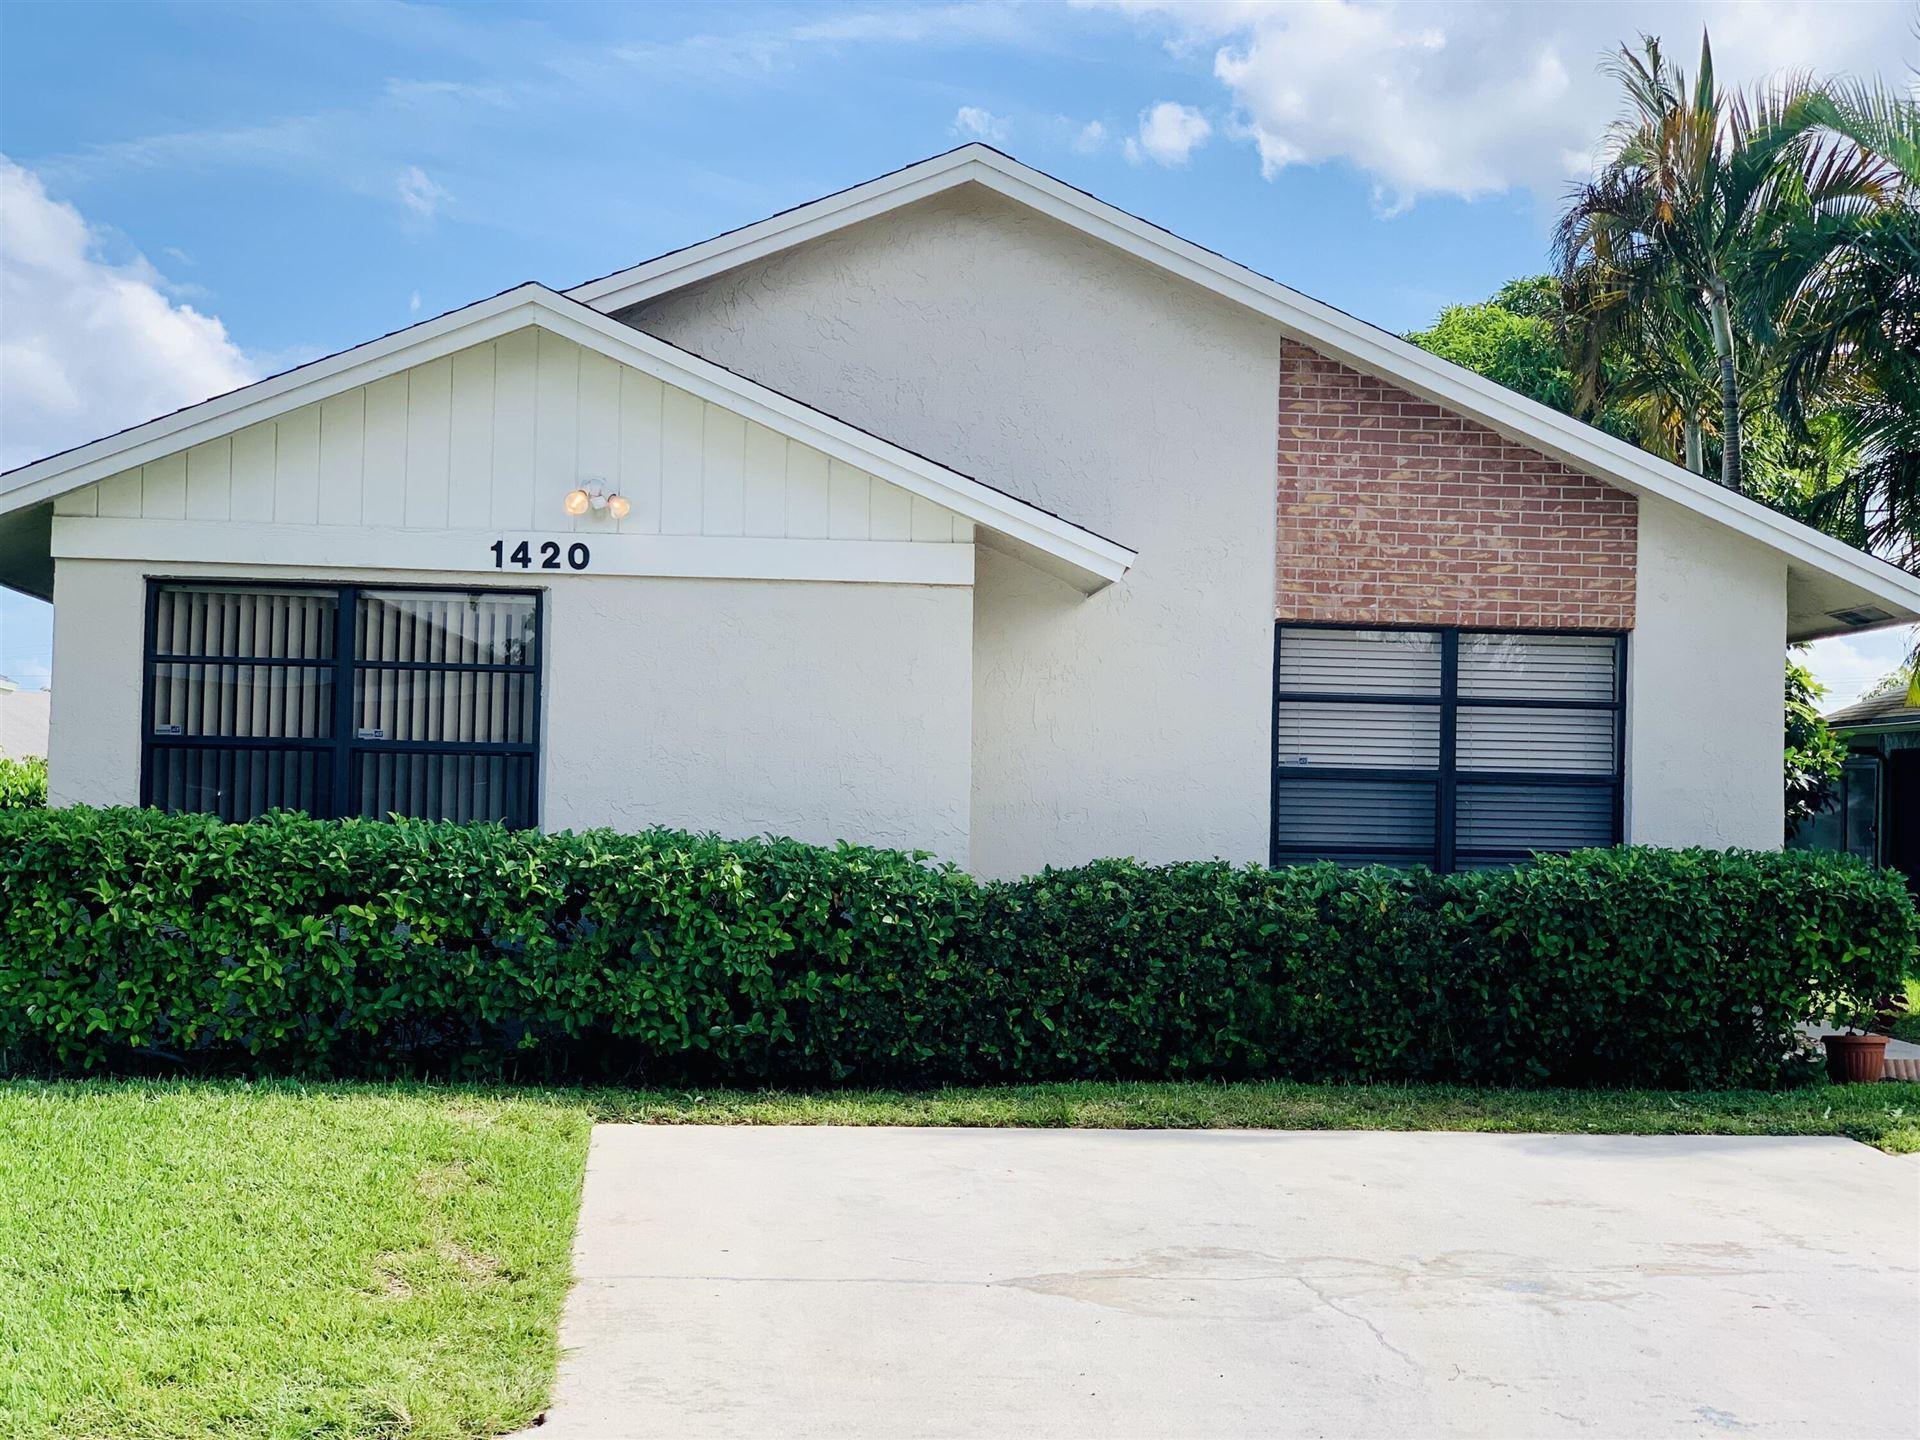 1420 Longarzo Place, West Palm Beach, FL 33415 - MLS#: RX-10754157